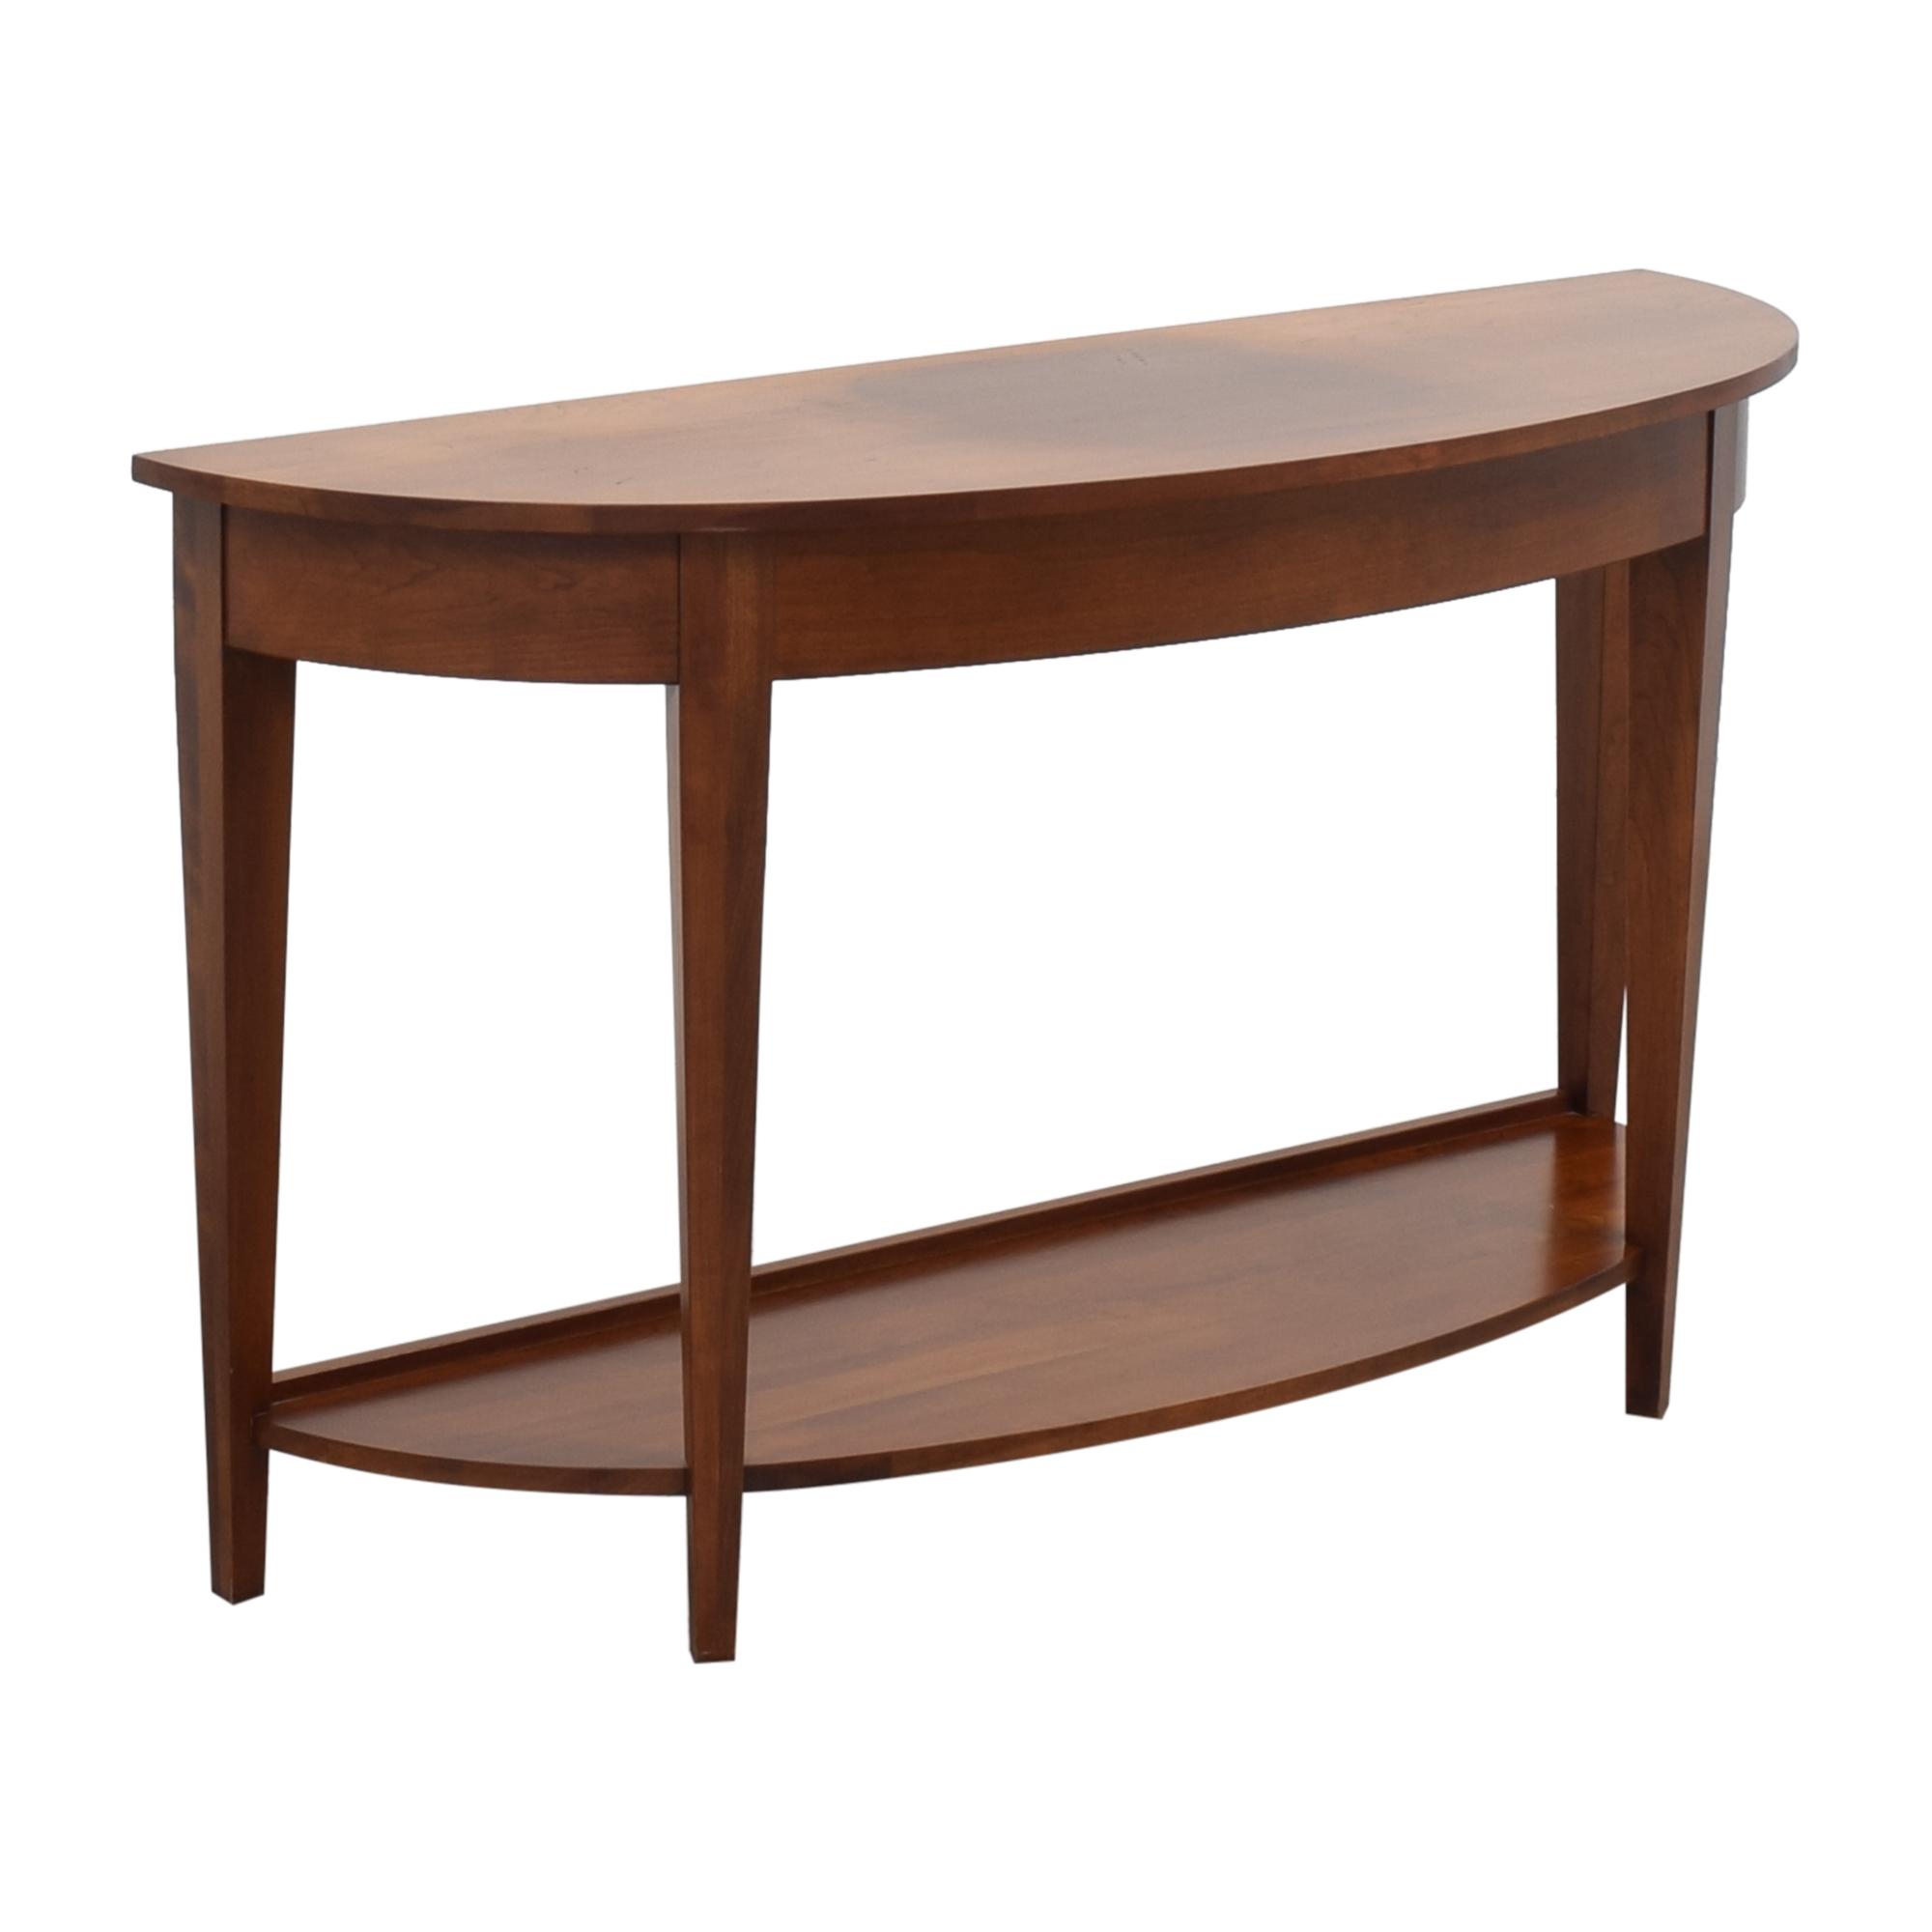 Ethan Allen Ethan Allen American Impressions Demilune Sofa Table pa